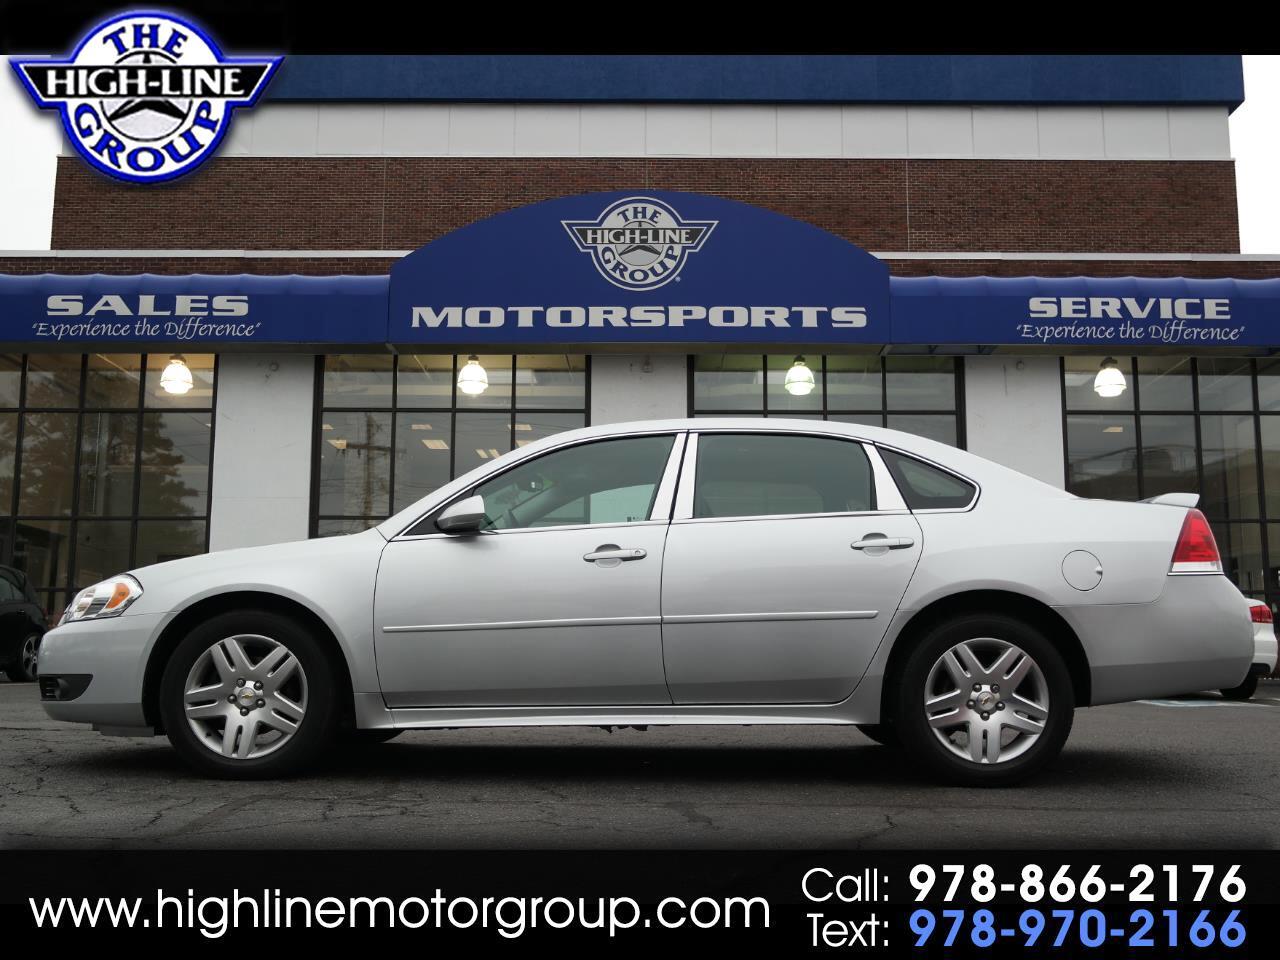 2010 Chevrolet Impala 4dr Sdn LT